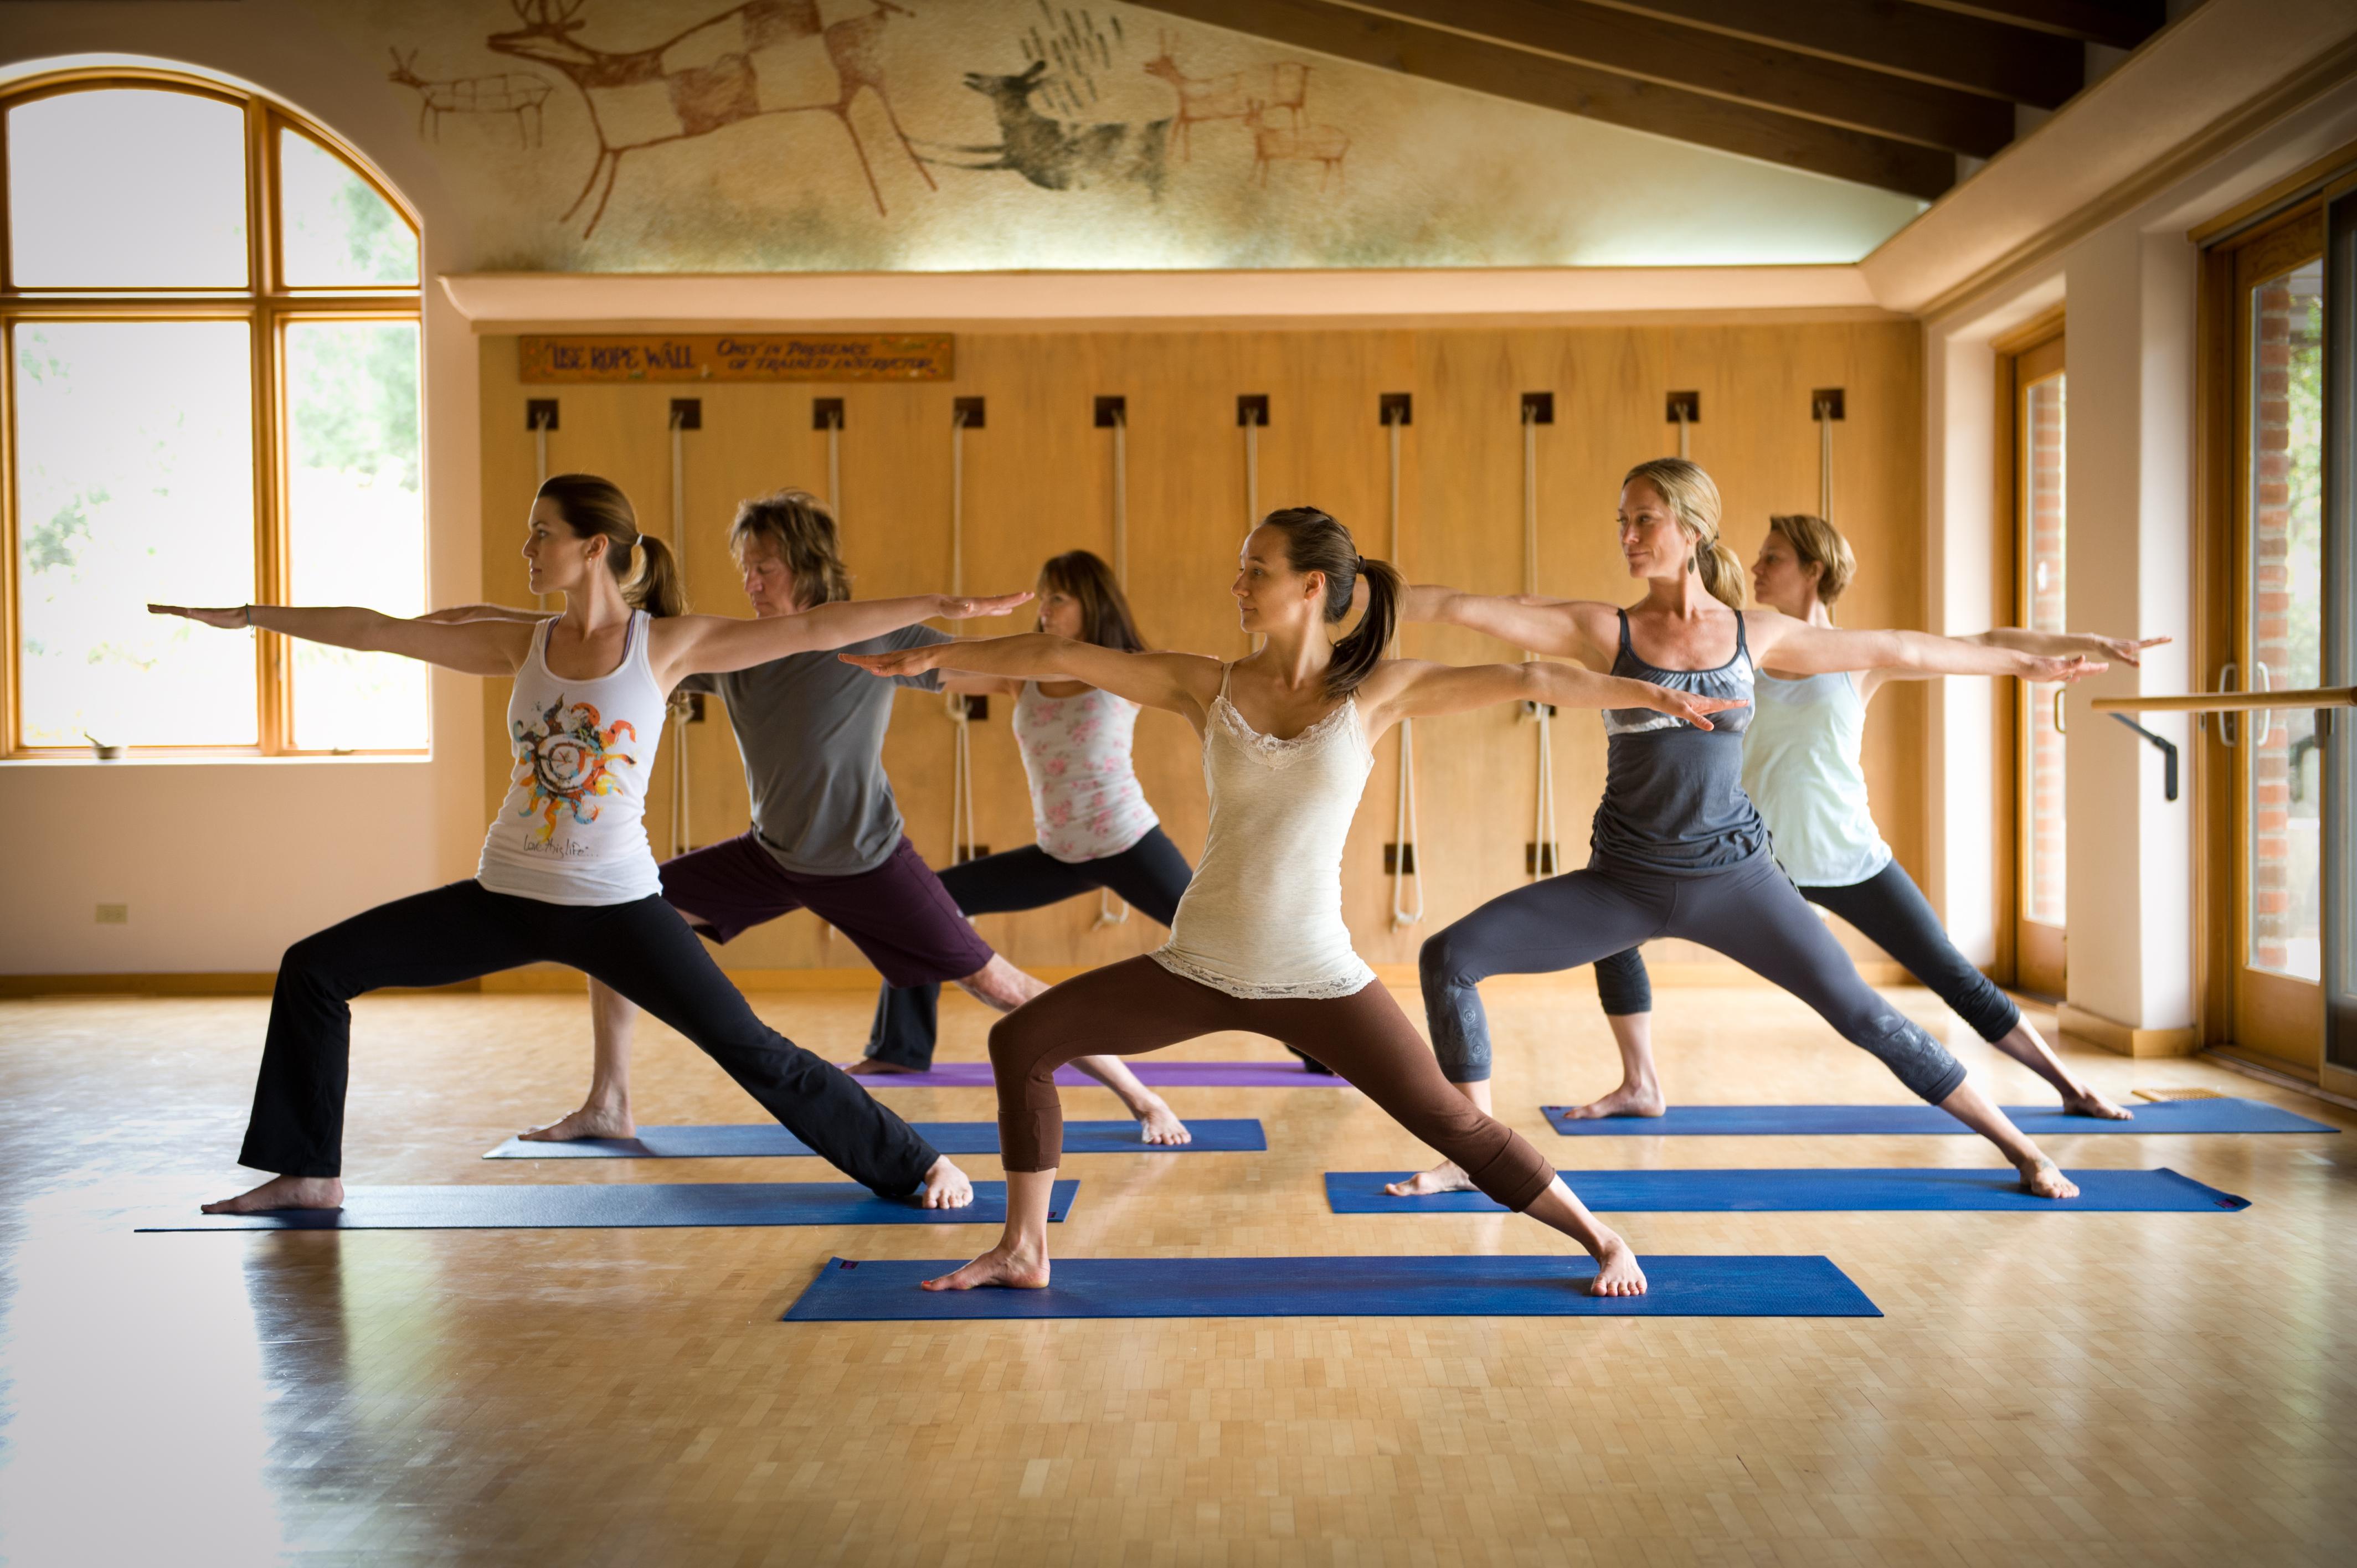 Ashtanga Yoga With Roswitha Kima Smale Rancho La Puerta